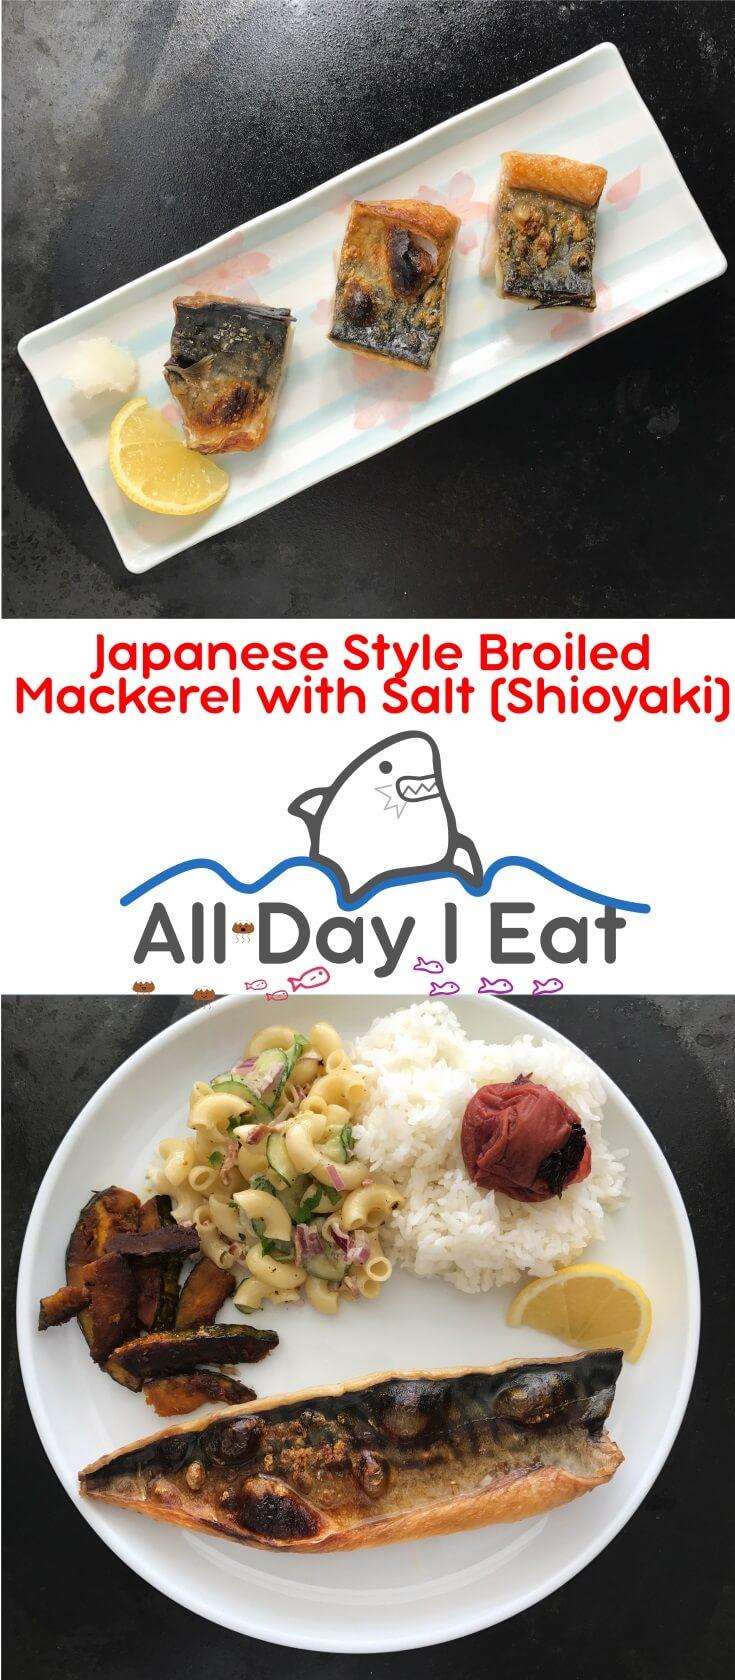 Japanese Style Broiled Mackerel with Salt (Shioyaki). One of the most tasty ways to make mackerel. Just add a bit of lemon + grated daikon!   www.alldayieat.com